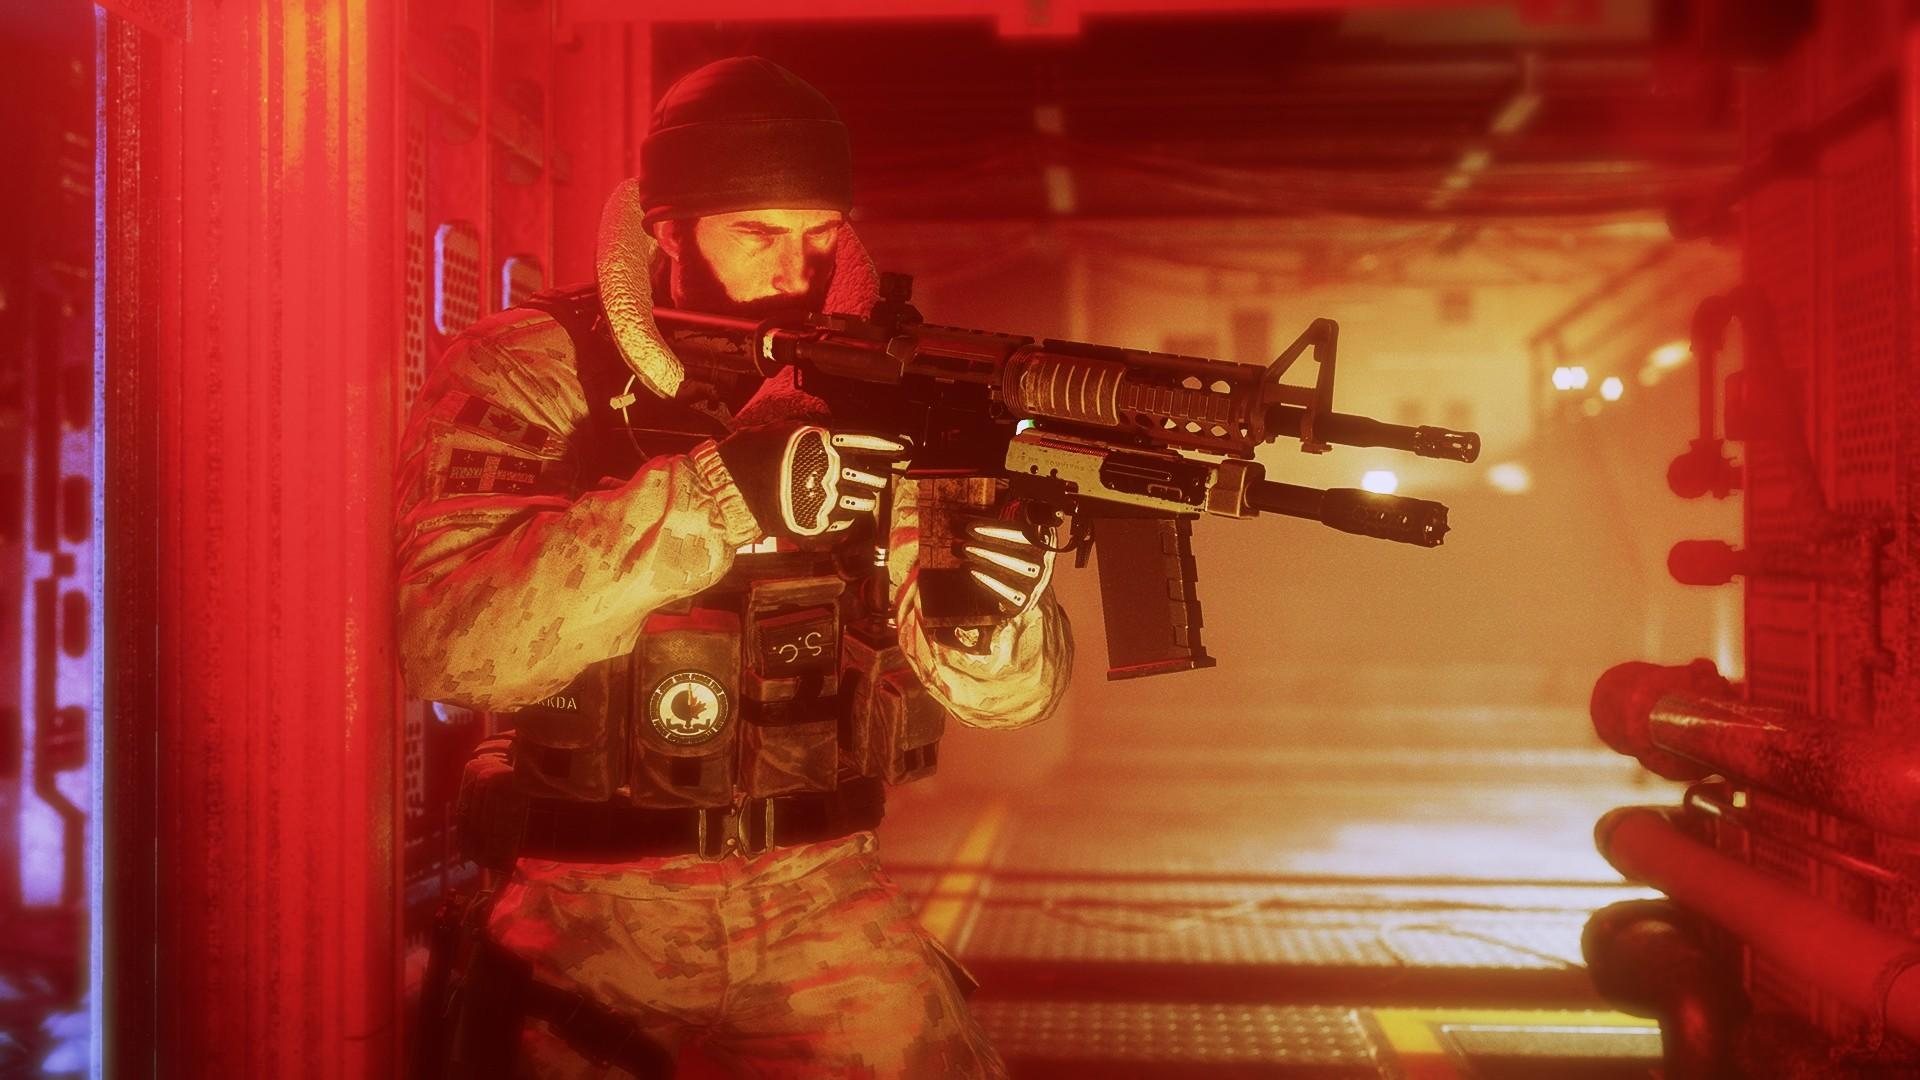 General 1920x1080 Rainbow Six: Siege Buck video games weapon soldier